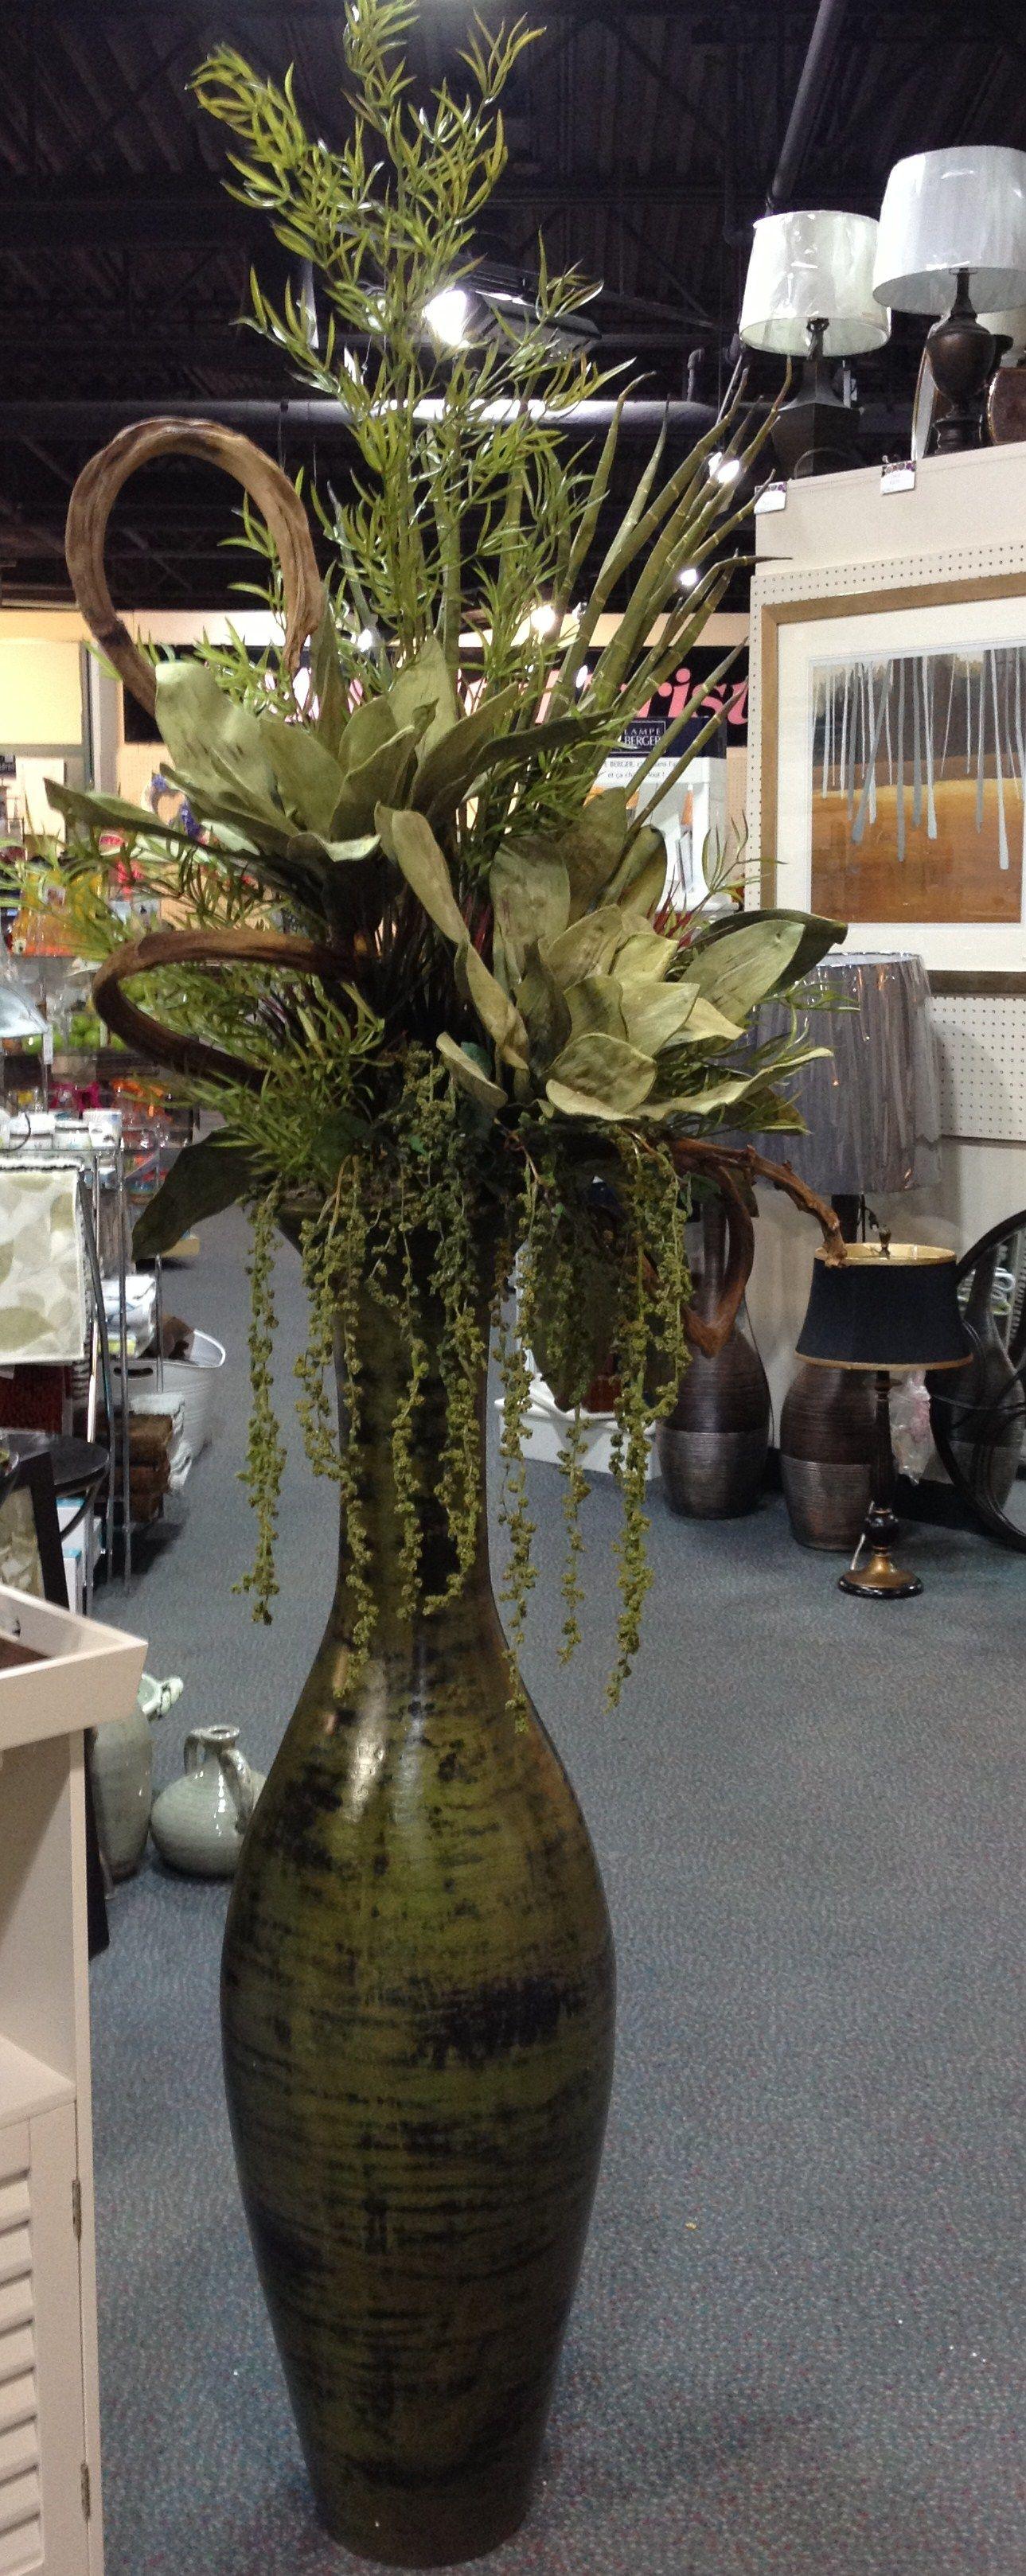 Pin By Leslie Bradshaw On My Design Capture Floor Vase Decor